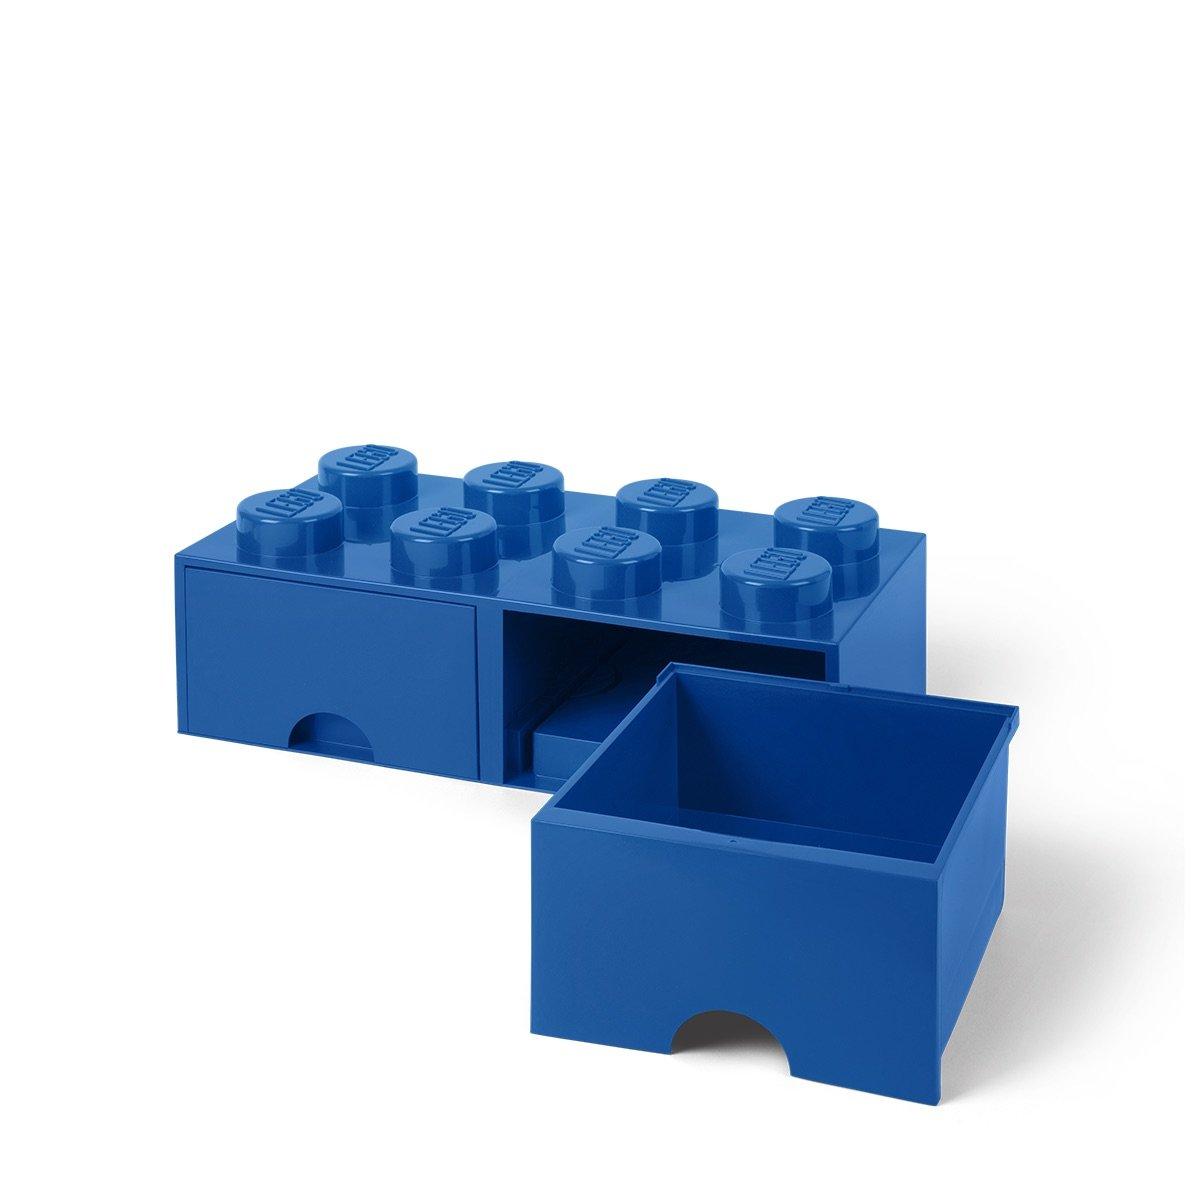 Genial Amazon.com: LEGO Brick Drawer, 8 Knobs, 2 Drawers, Stackable Storage Box,  Bright Blue: Room Copenhagen: Home U0026 Kitchen